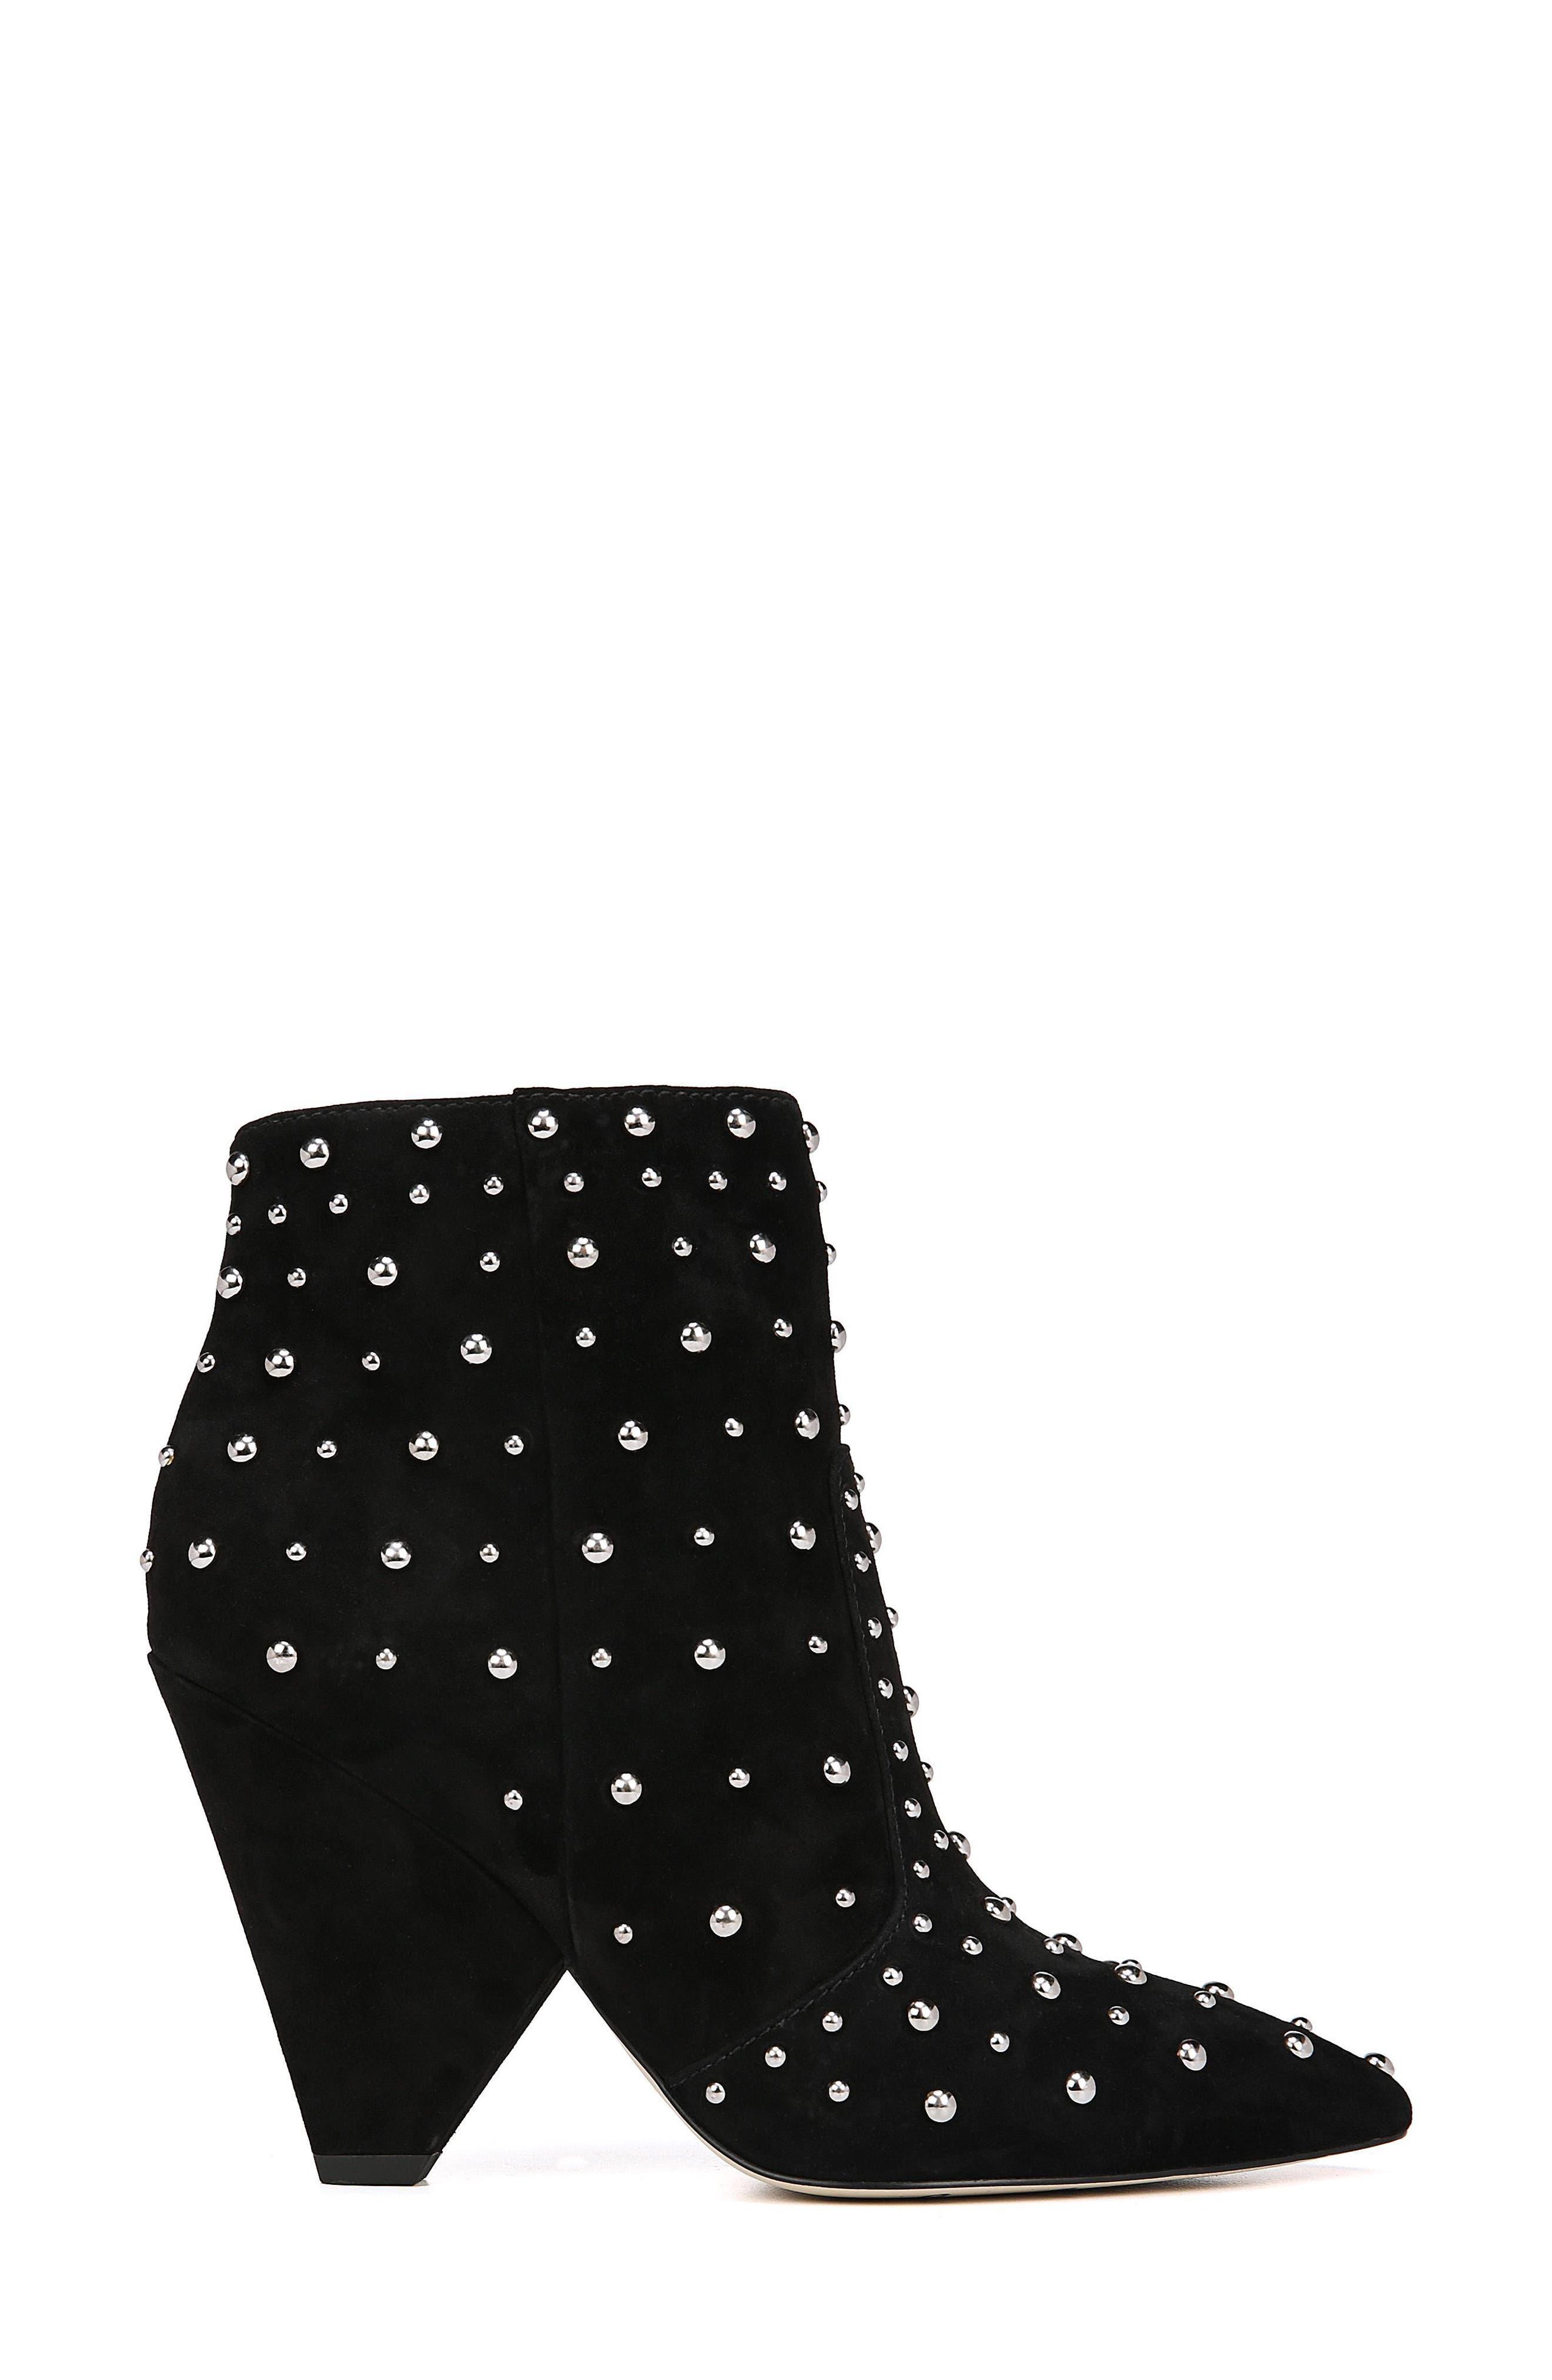 Roya Studded Boot,                             Alternate thumbnail 3, color,                             BLACK SUEDE